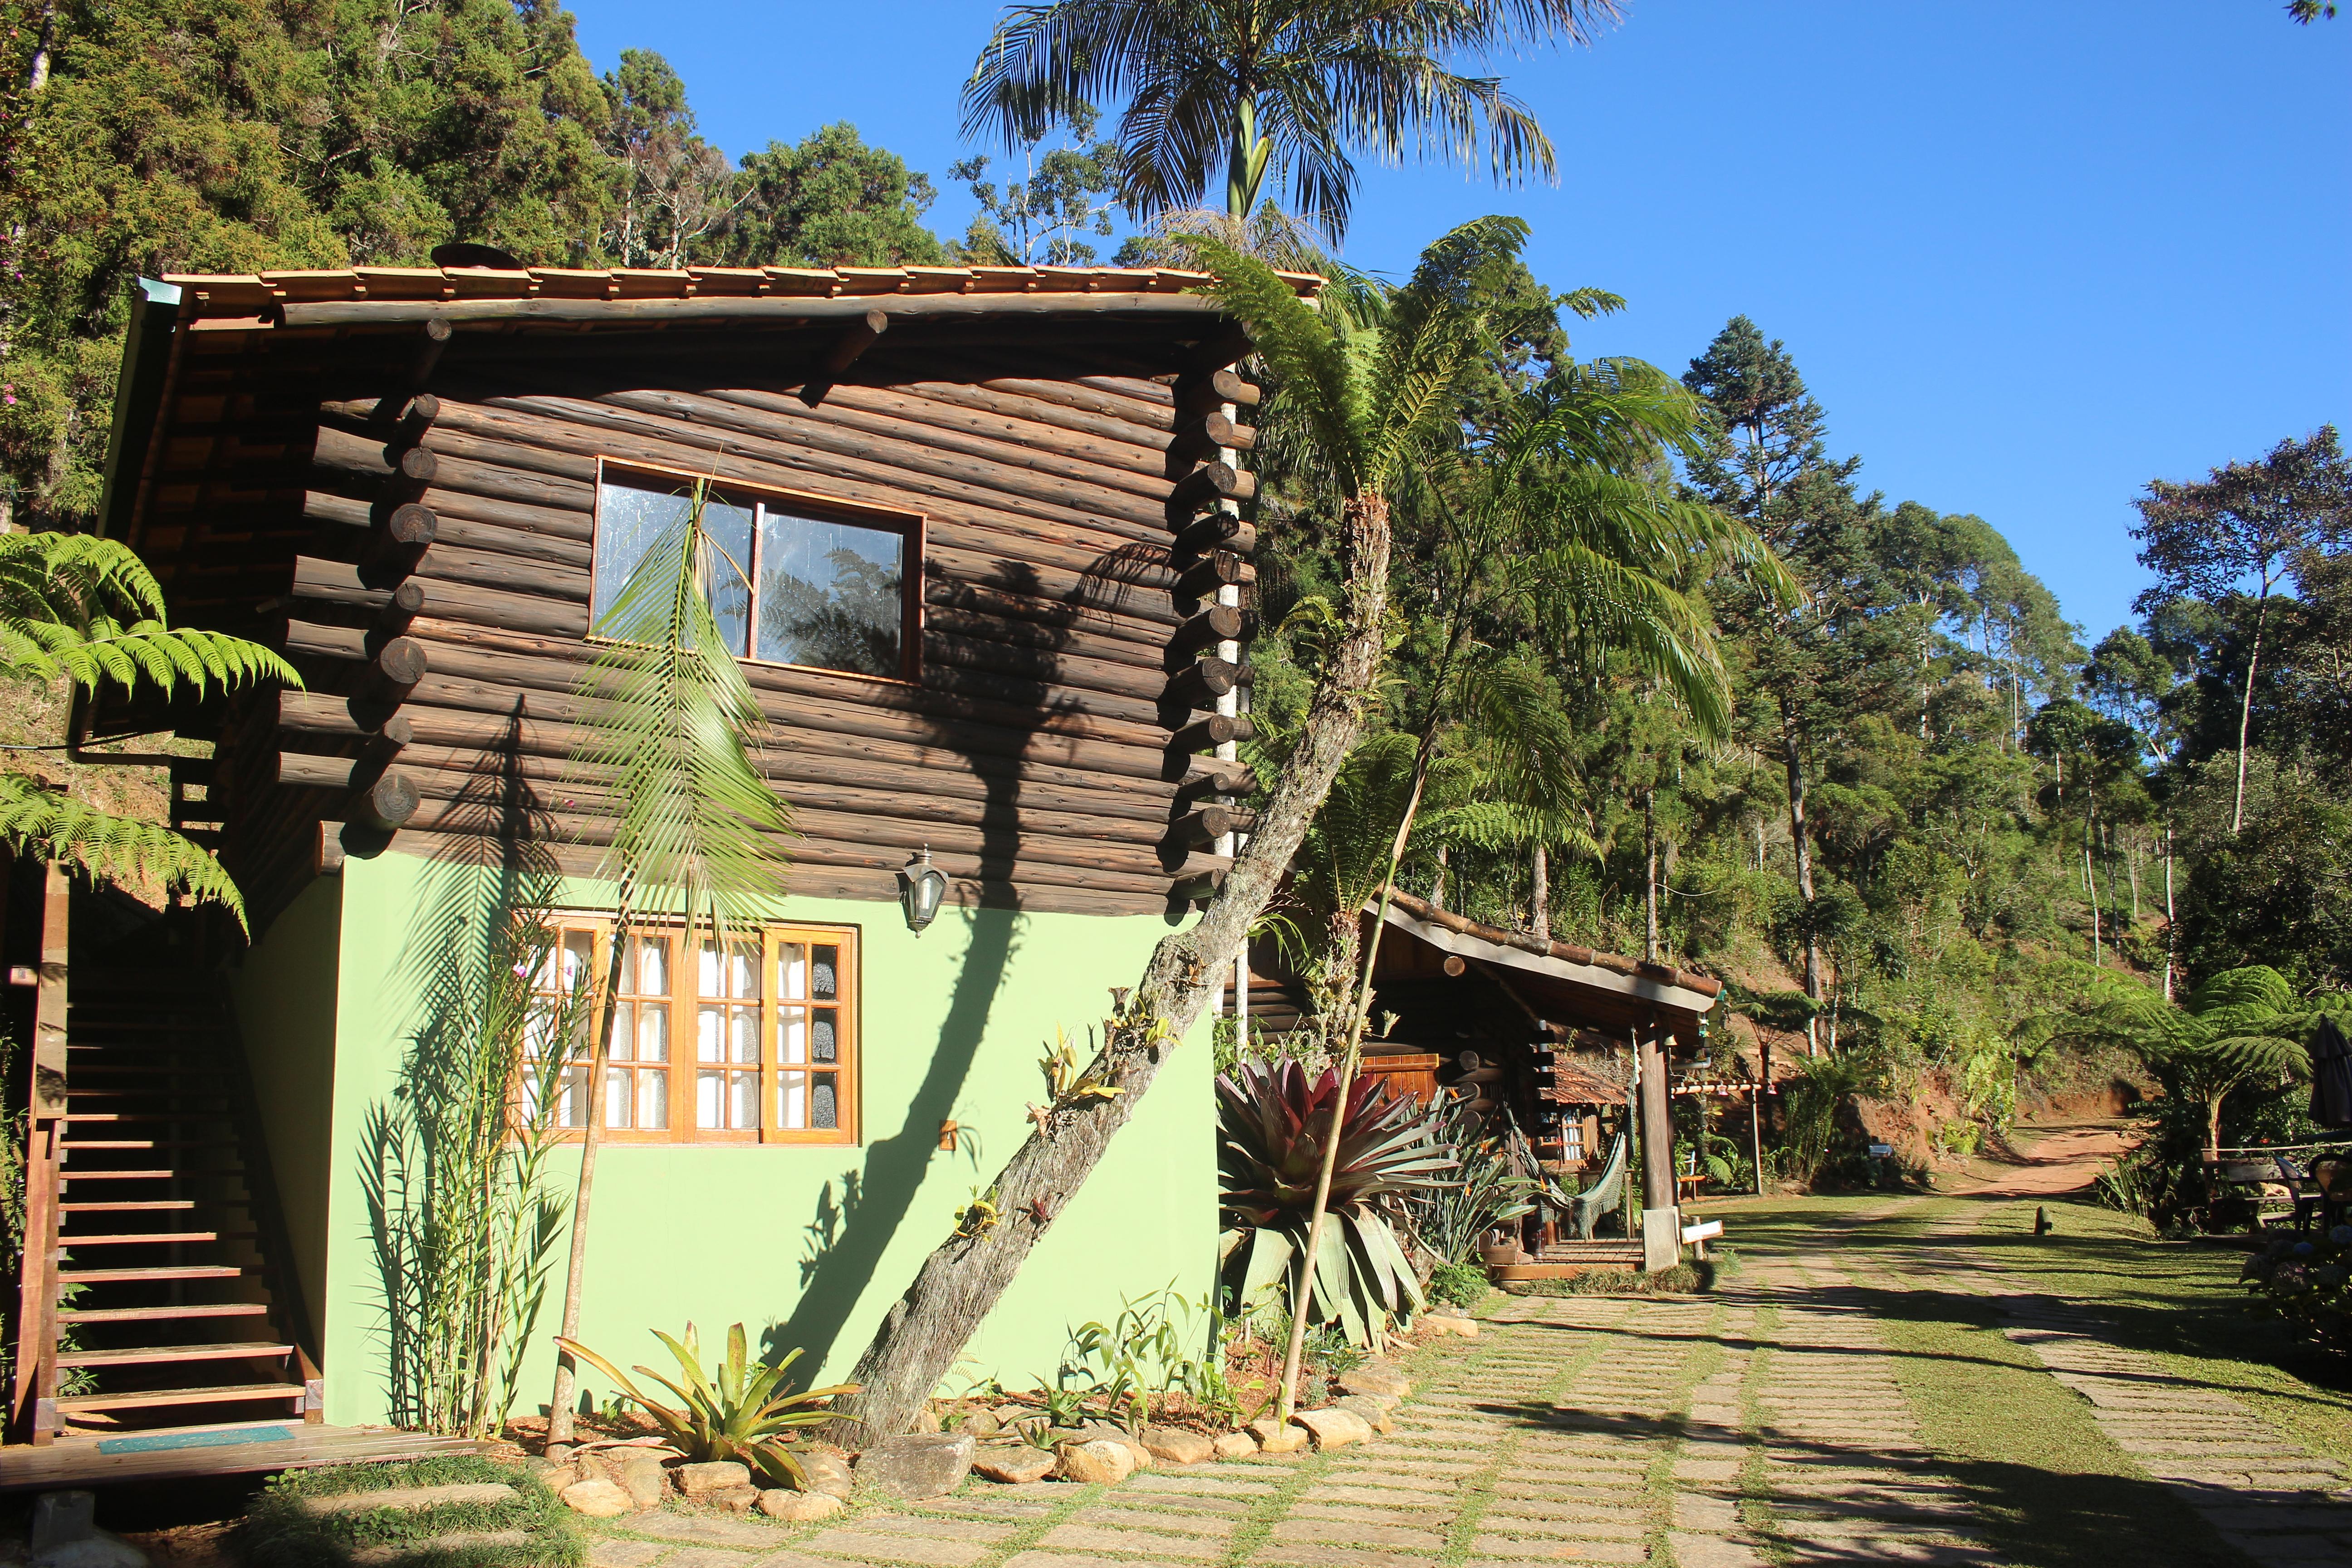 The Eco Lodge Itororó Brazil